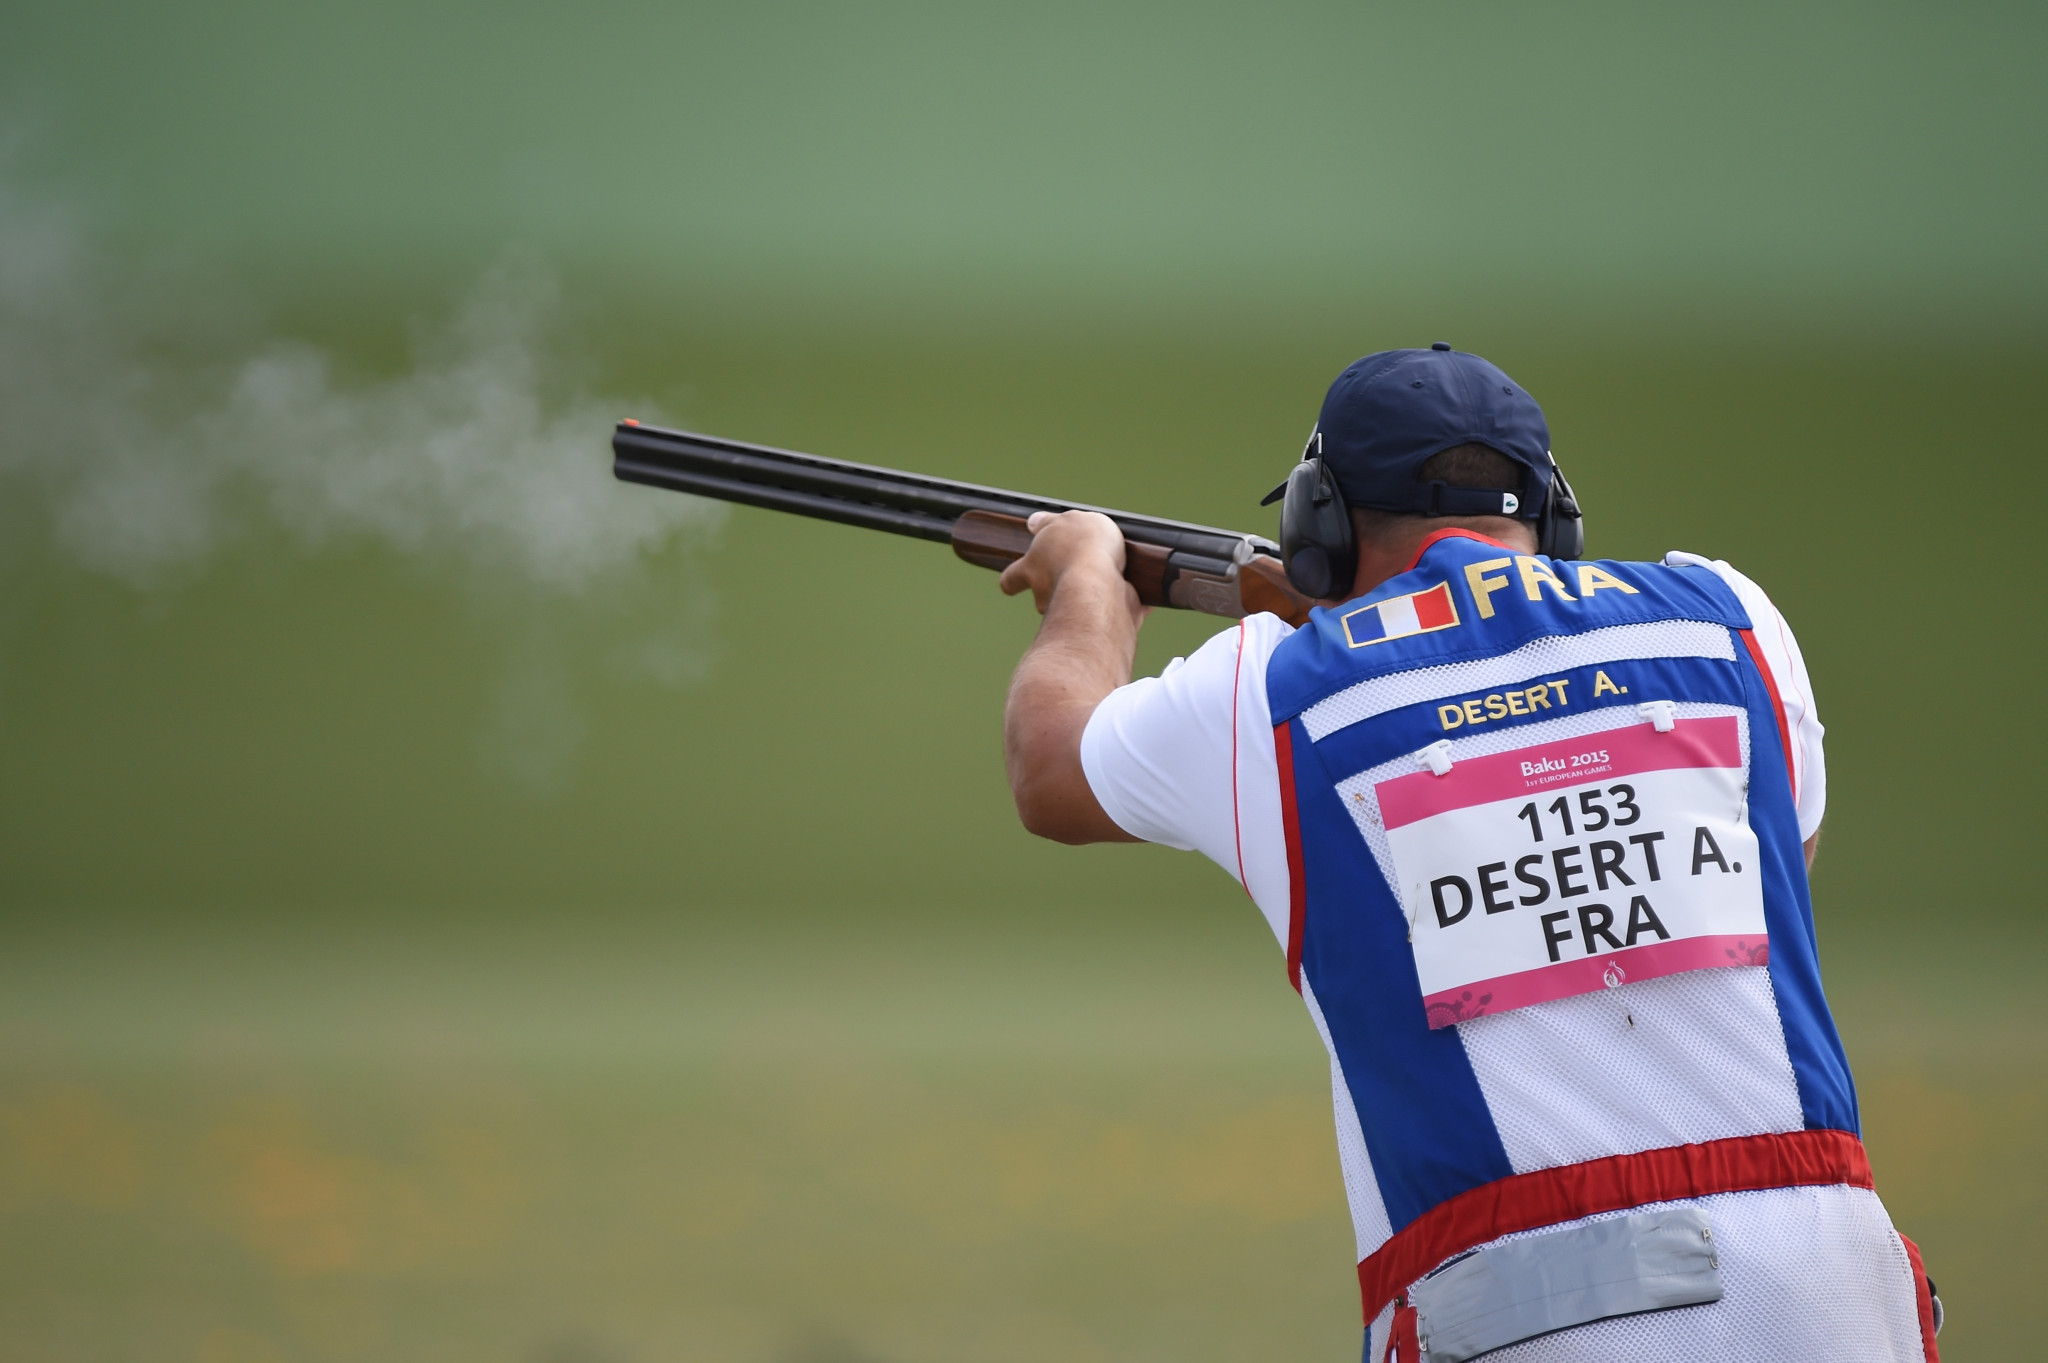 Antonin Desert was part of France's gold medal-winning team ©Getty Images